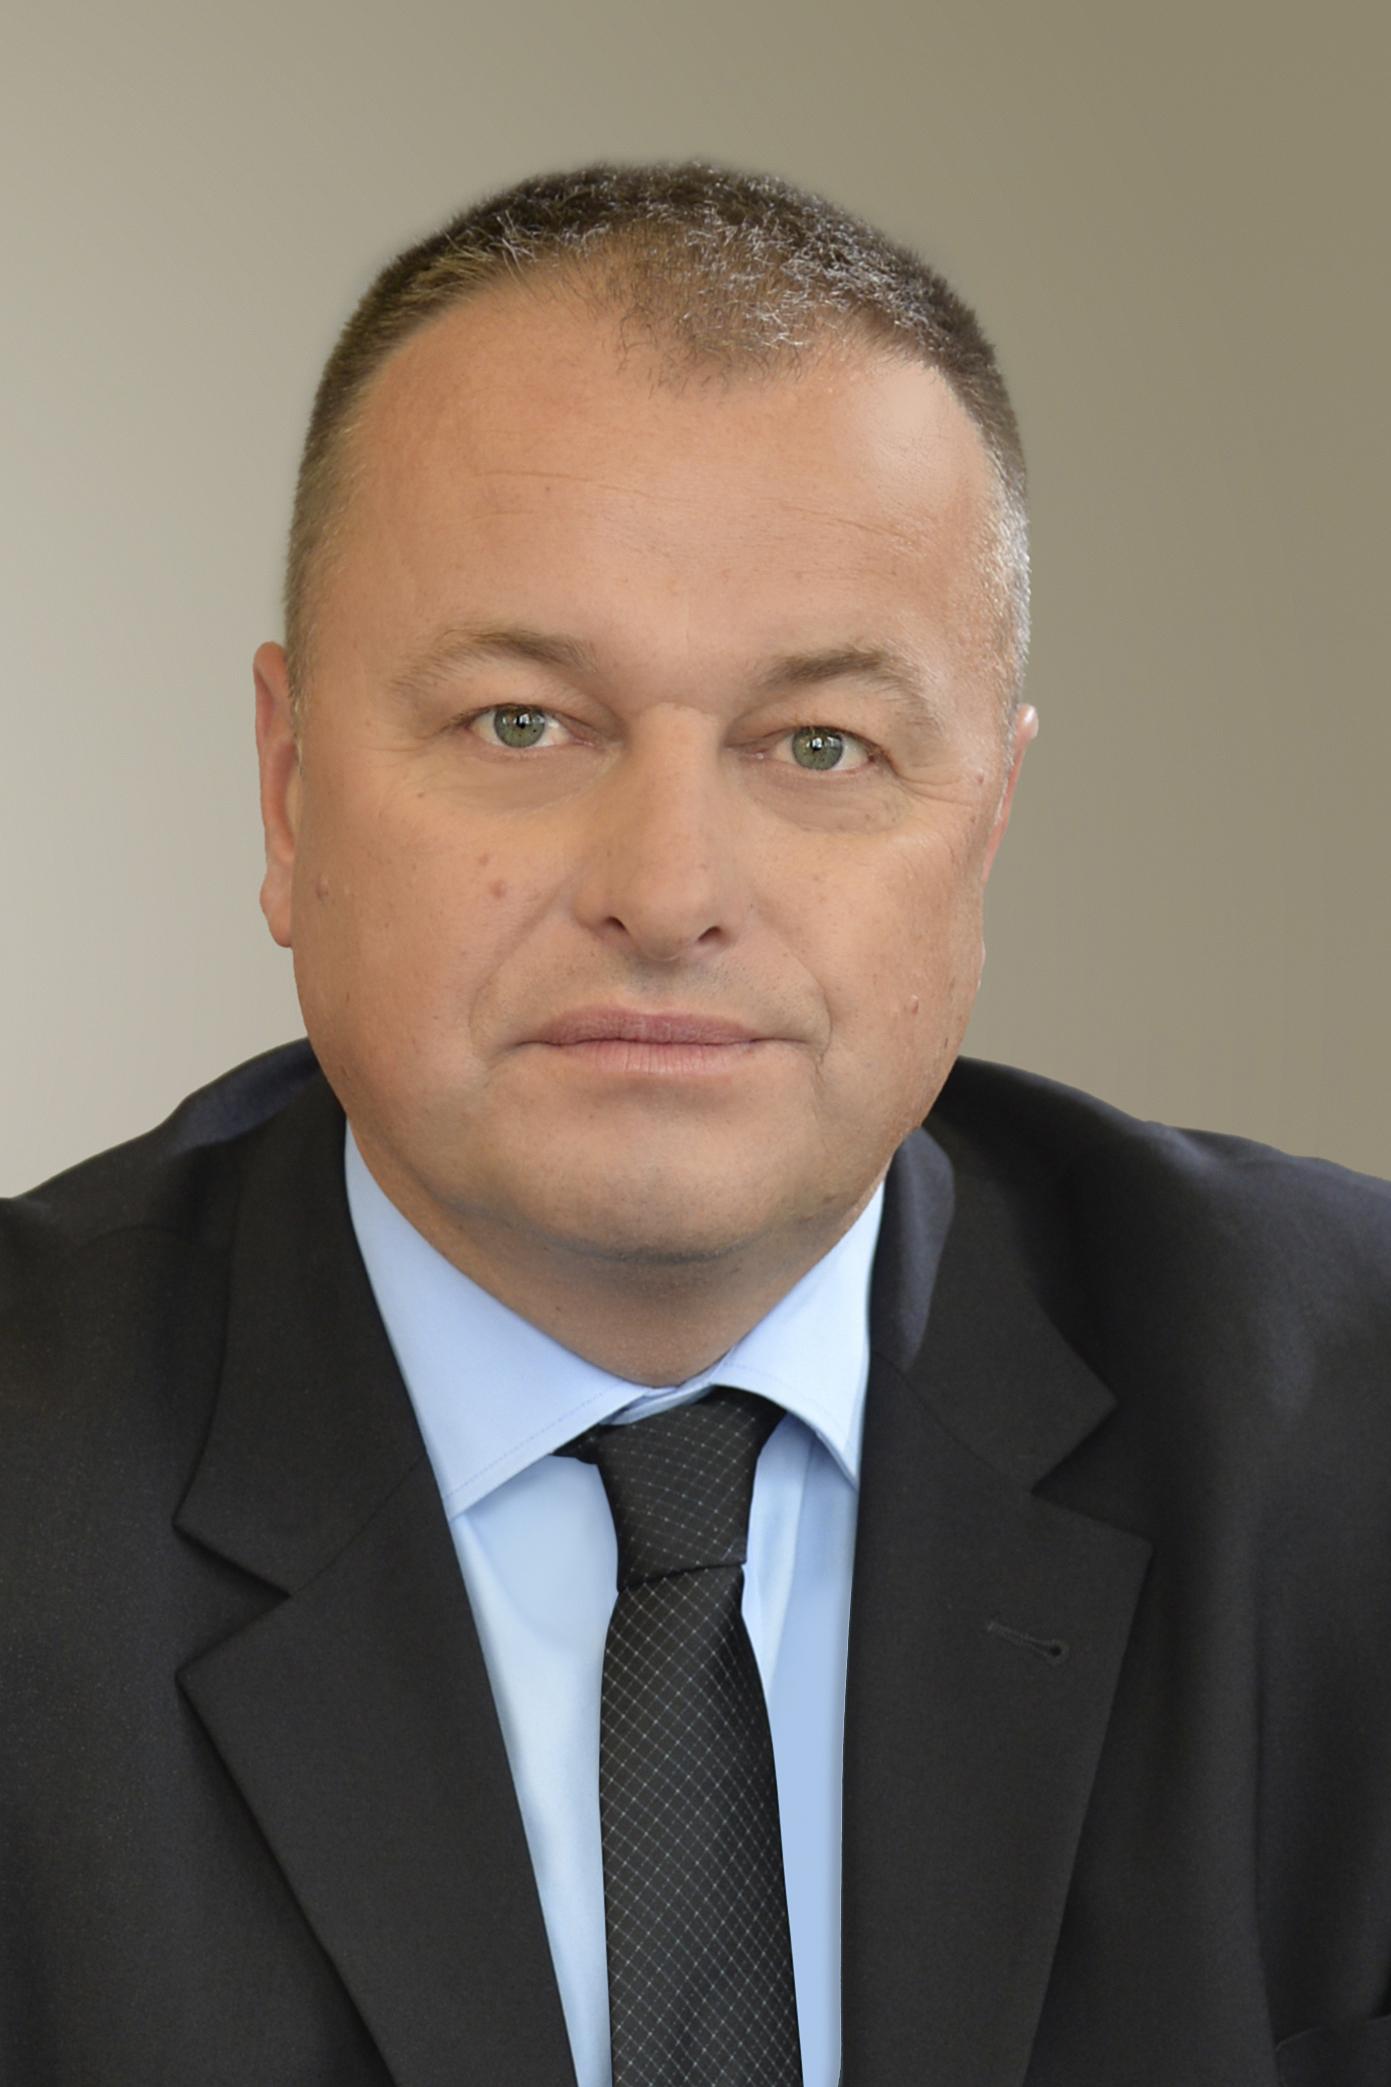 Robert Trnovec